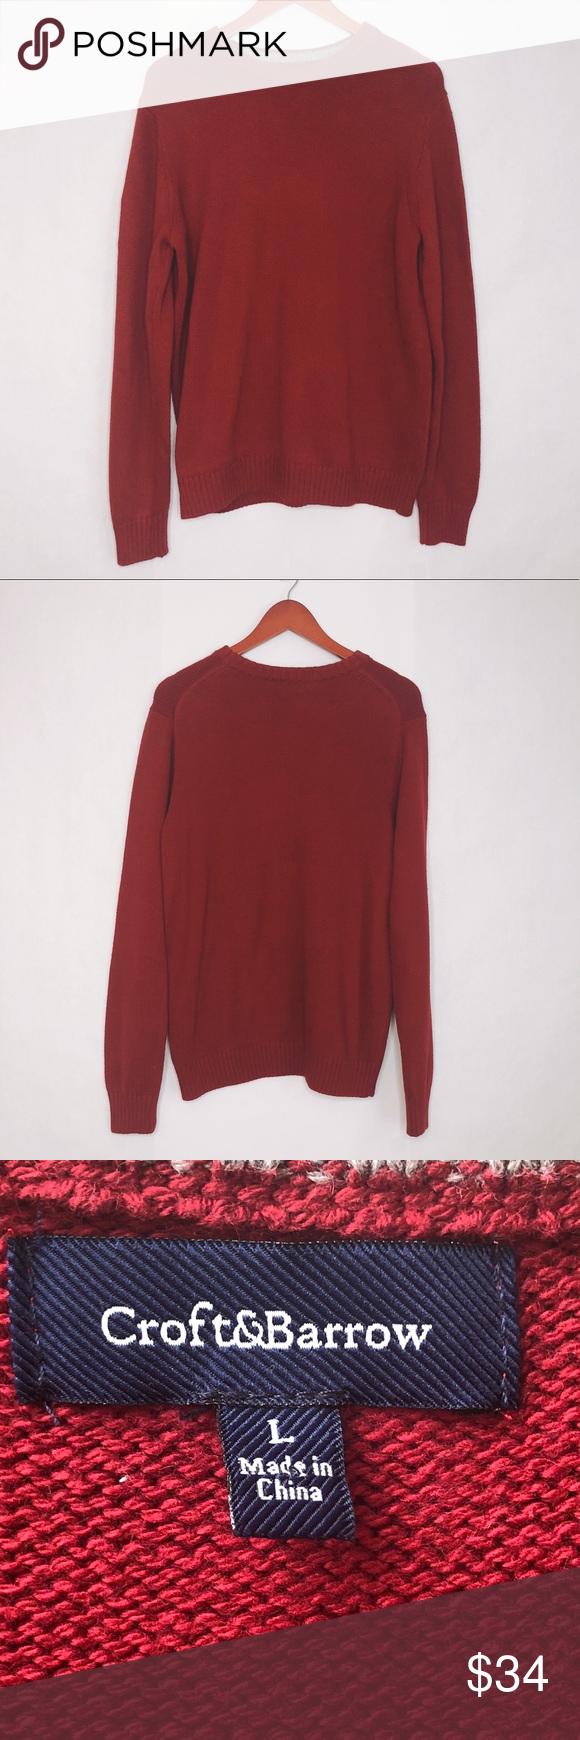 Croft Barrow Red Crewneck Sweater Mens Sz Large Croft Barrow Red Crewneck Sweater Mens Size Large Cotton Blend Men Sweater Crew Neck Sweater Sweaters [ 1740 x 580 Pixel ]